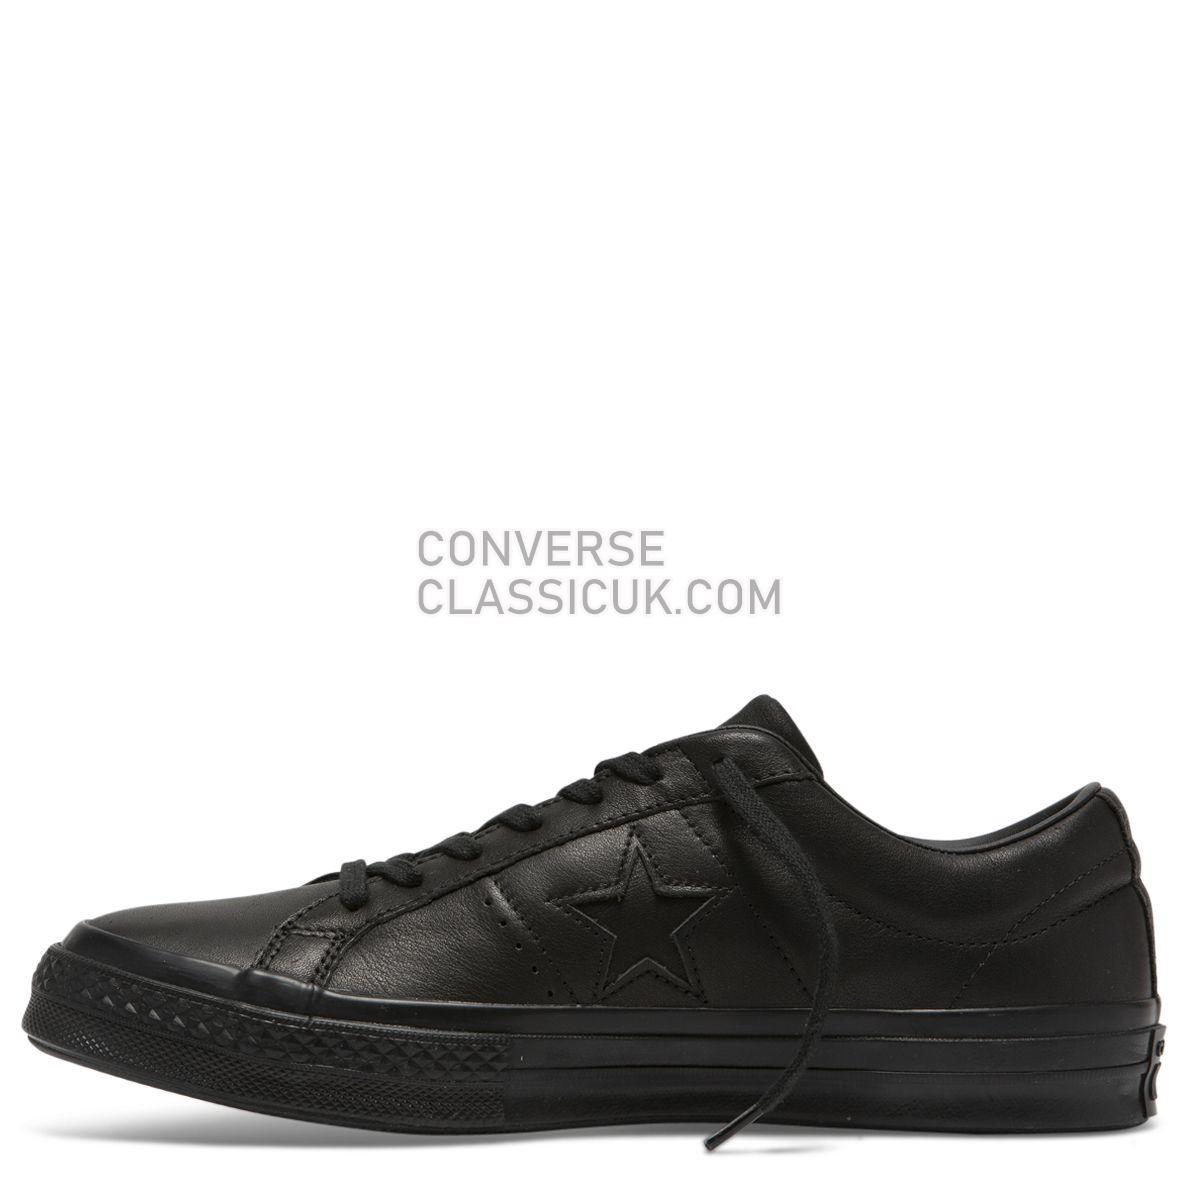 Converse One Star Leather Low Top Black/Black Mens Womens Unisex 163110 Black/Black/Black Shoes